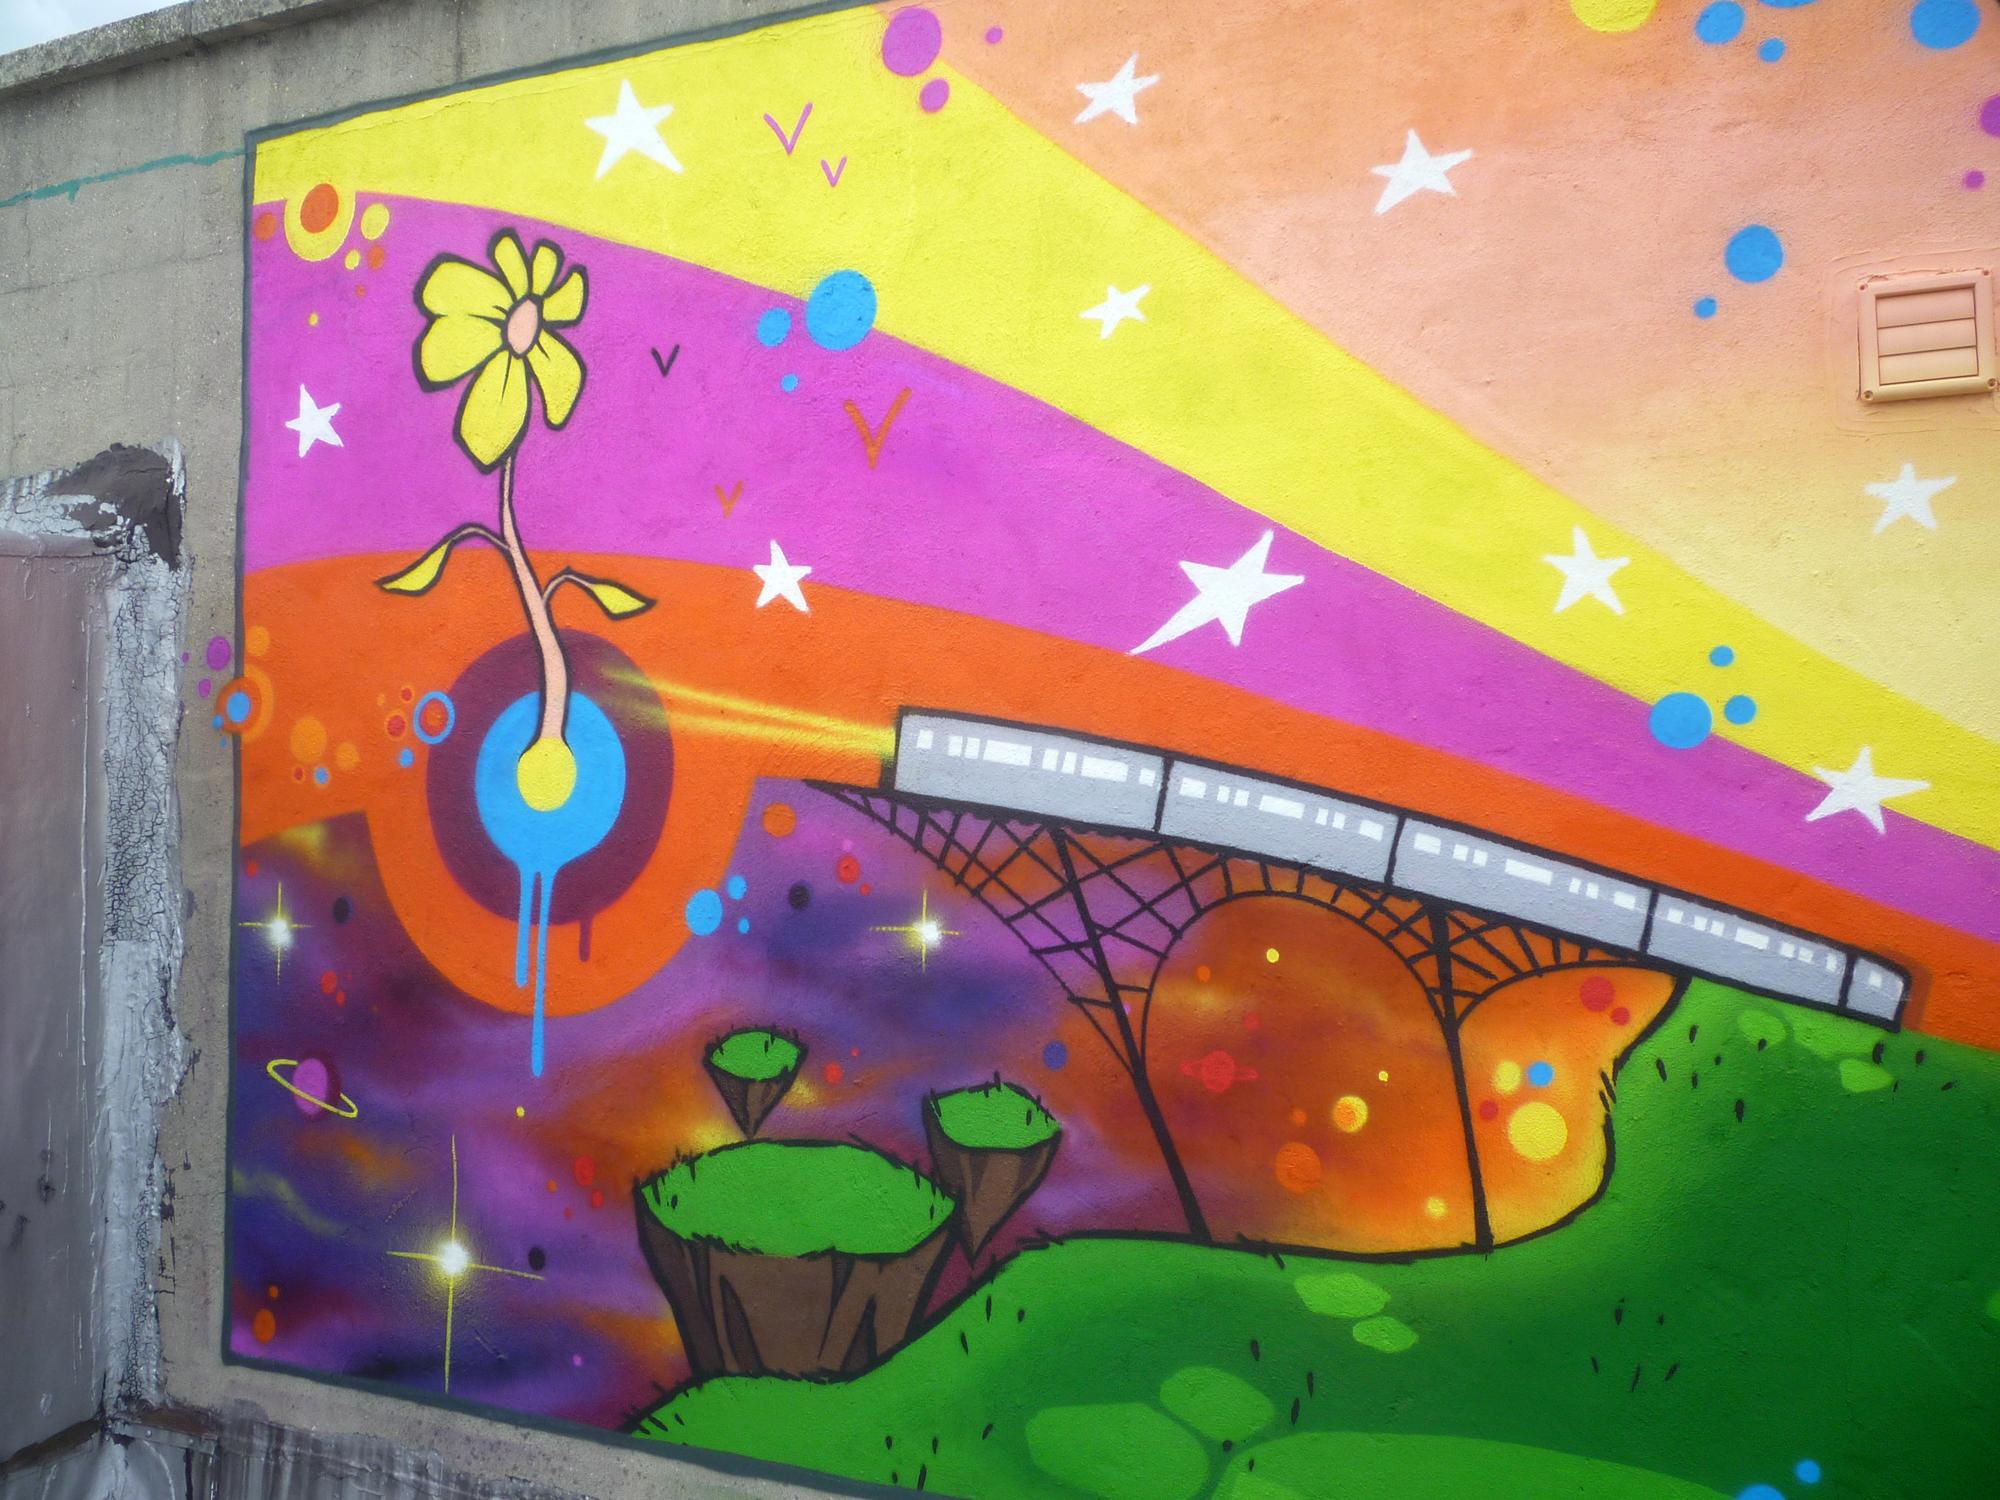 graffiti artist for hire nyc, graffiti artist for hire, custom mural, graffiti portrait, logo reproduction, graffiti artist, graffiti